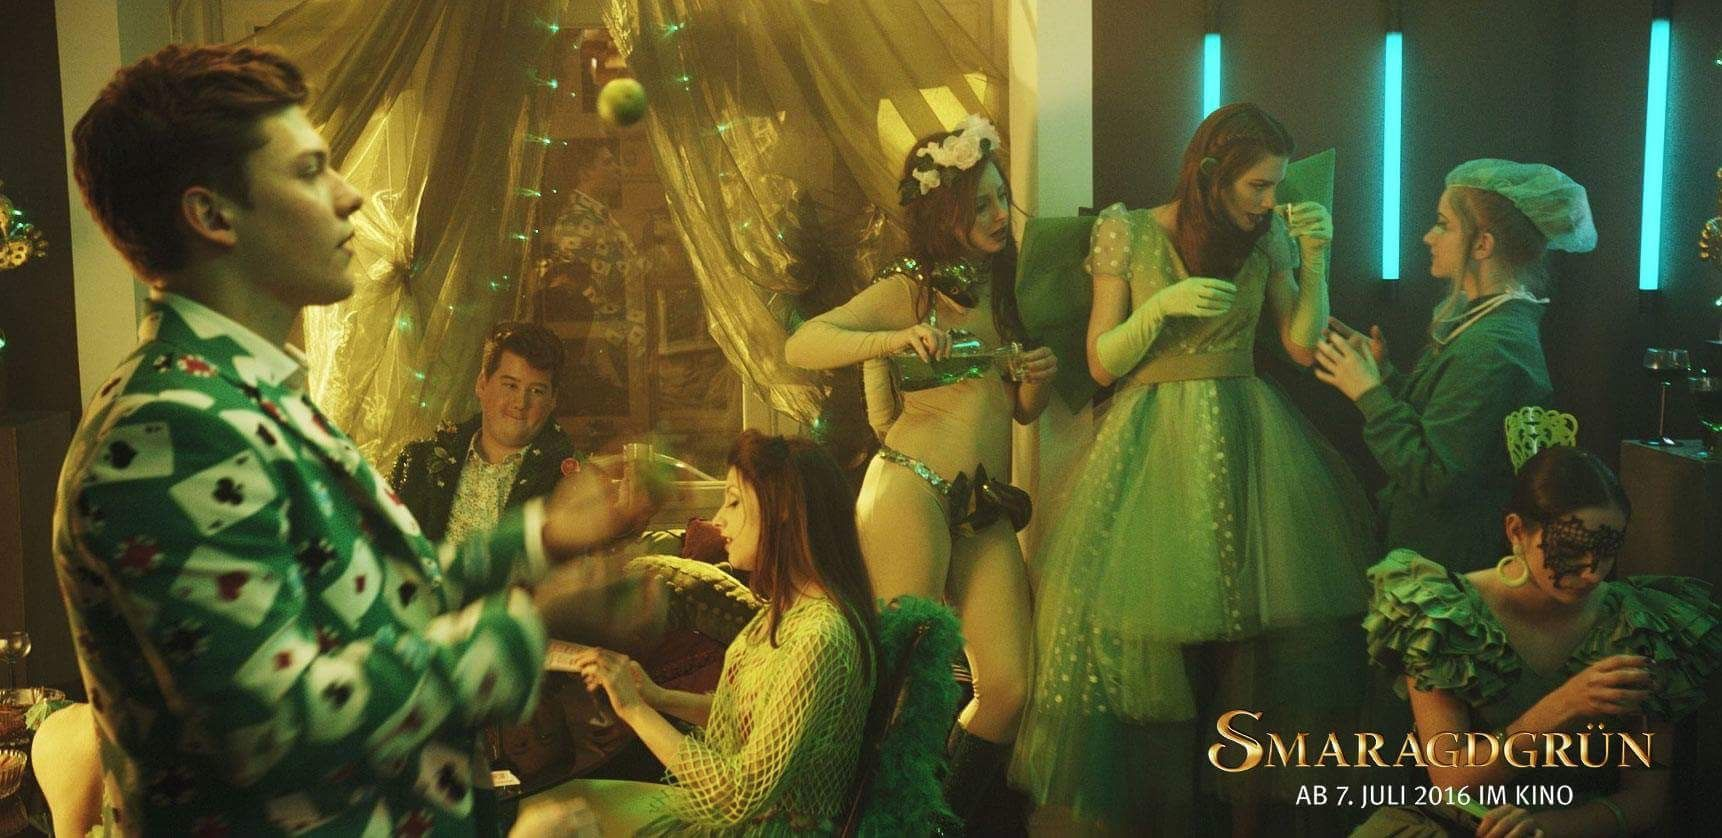 Smaragdgrün Online Film